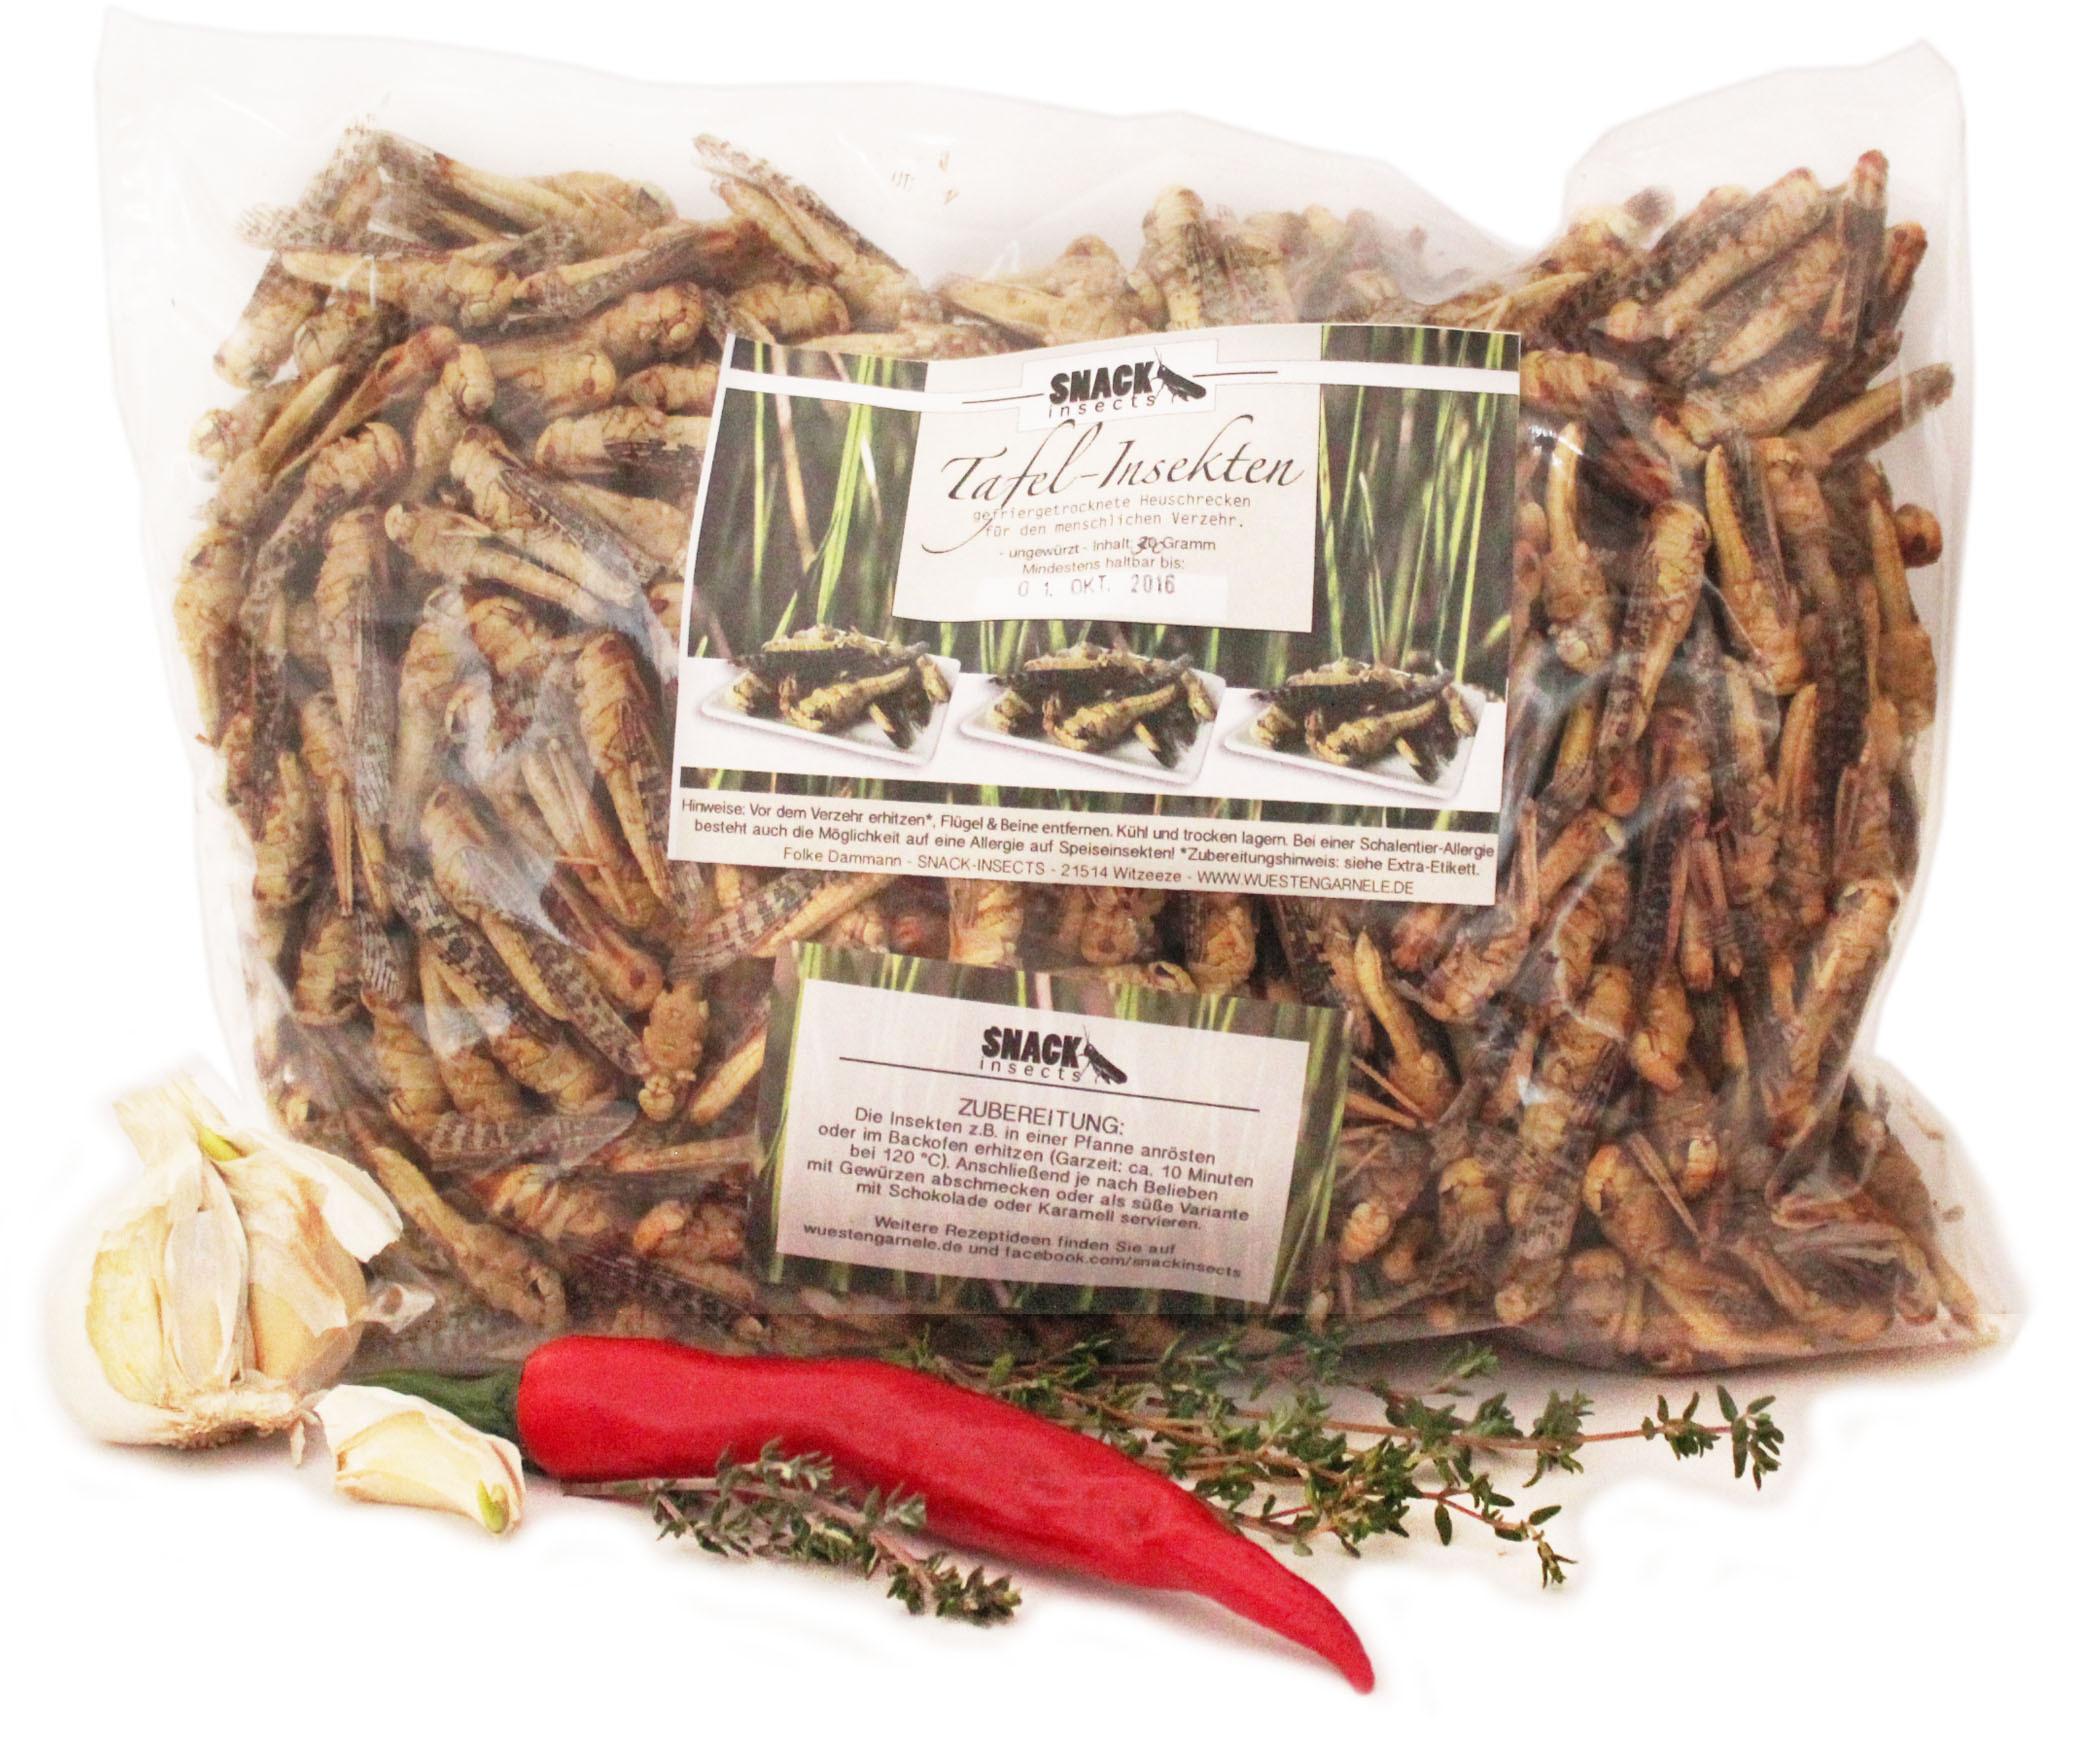 Snack-Insects_Gastronomie_Insekten_Snack_Rohrchen_Kopie